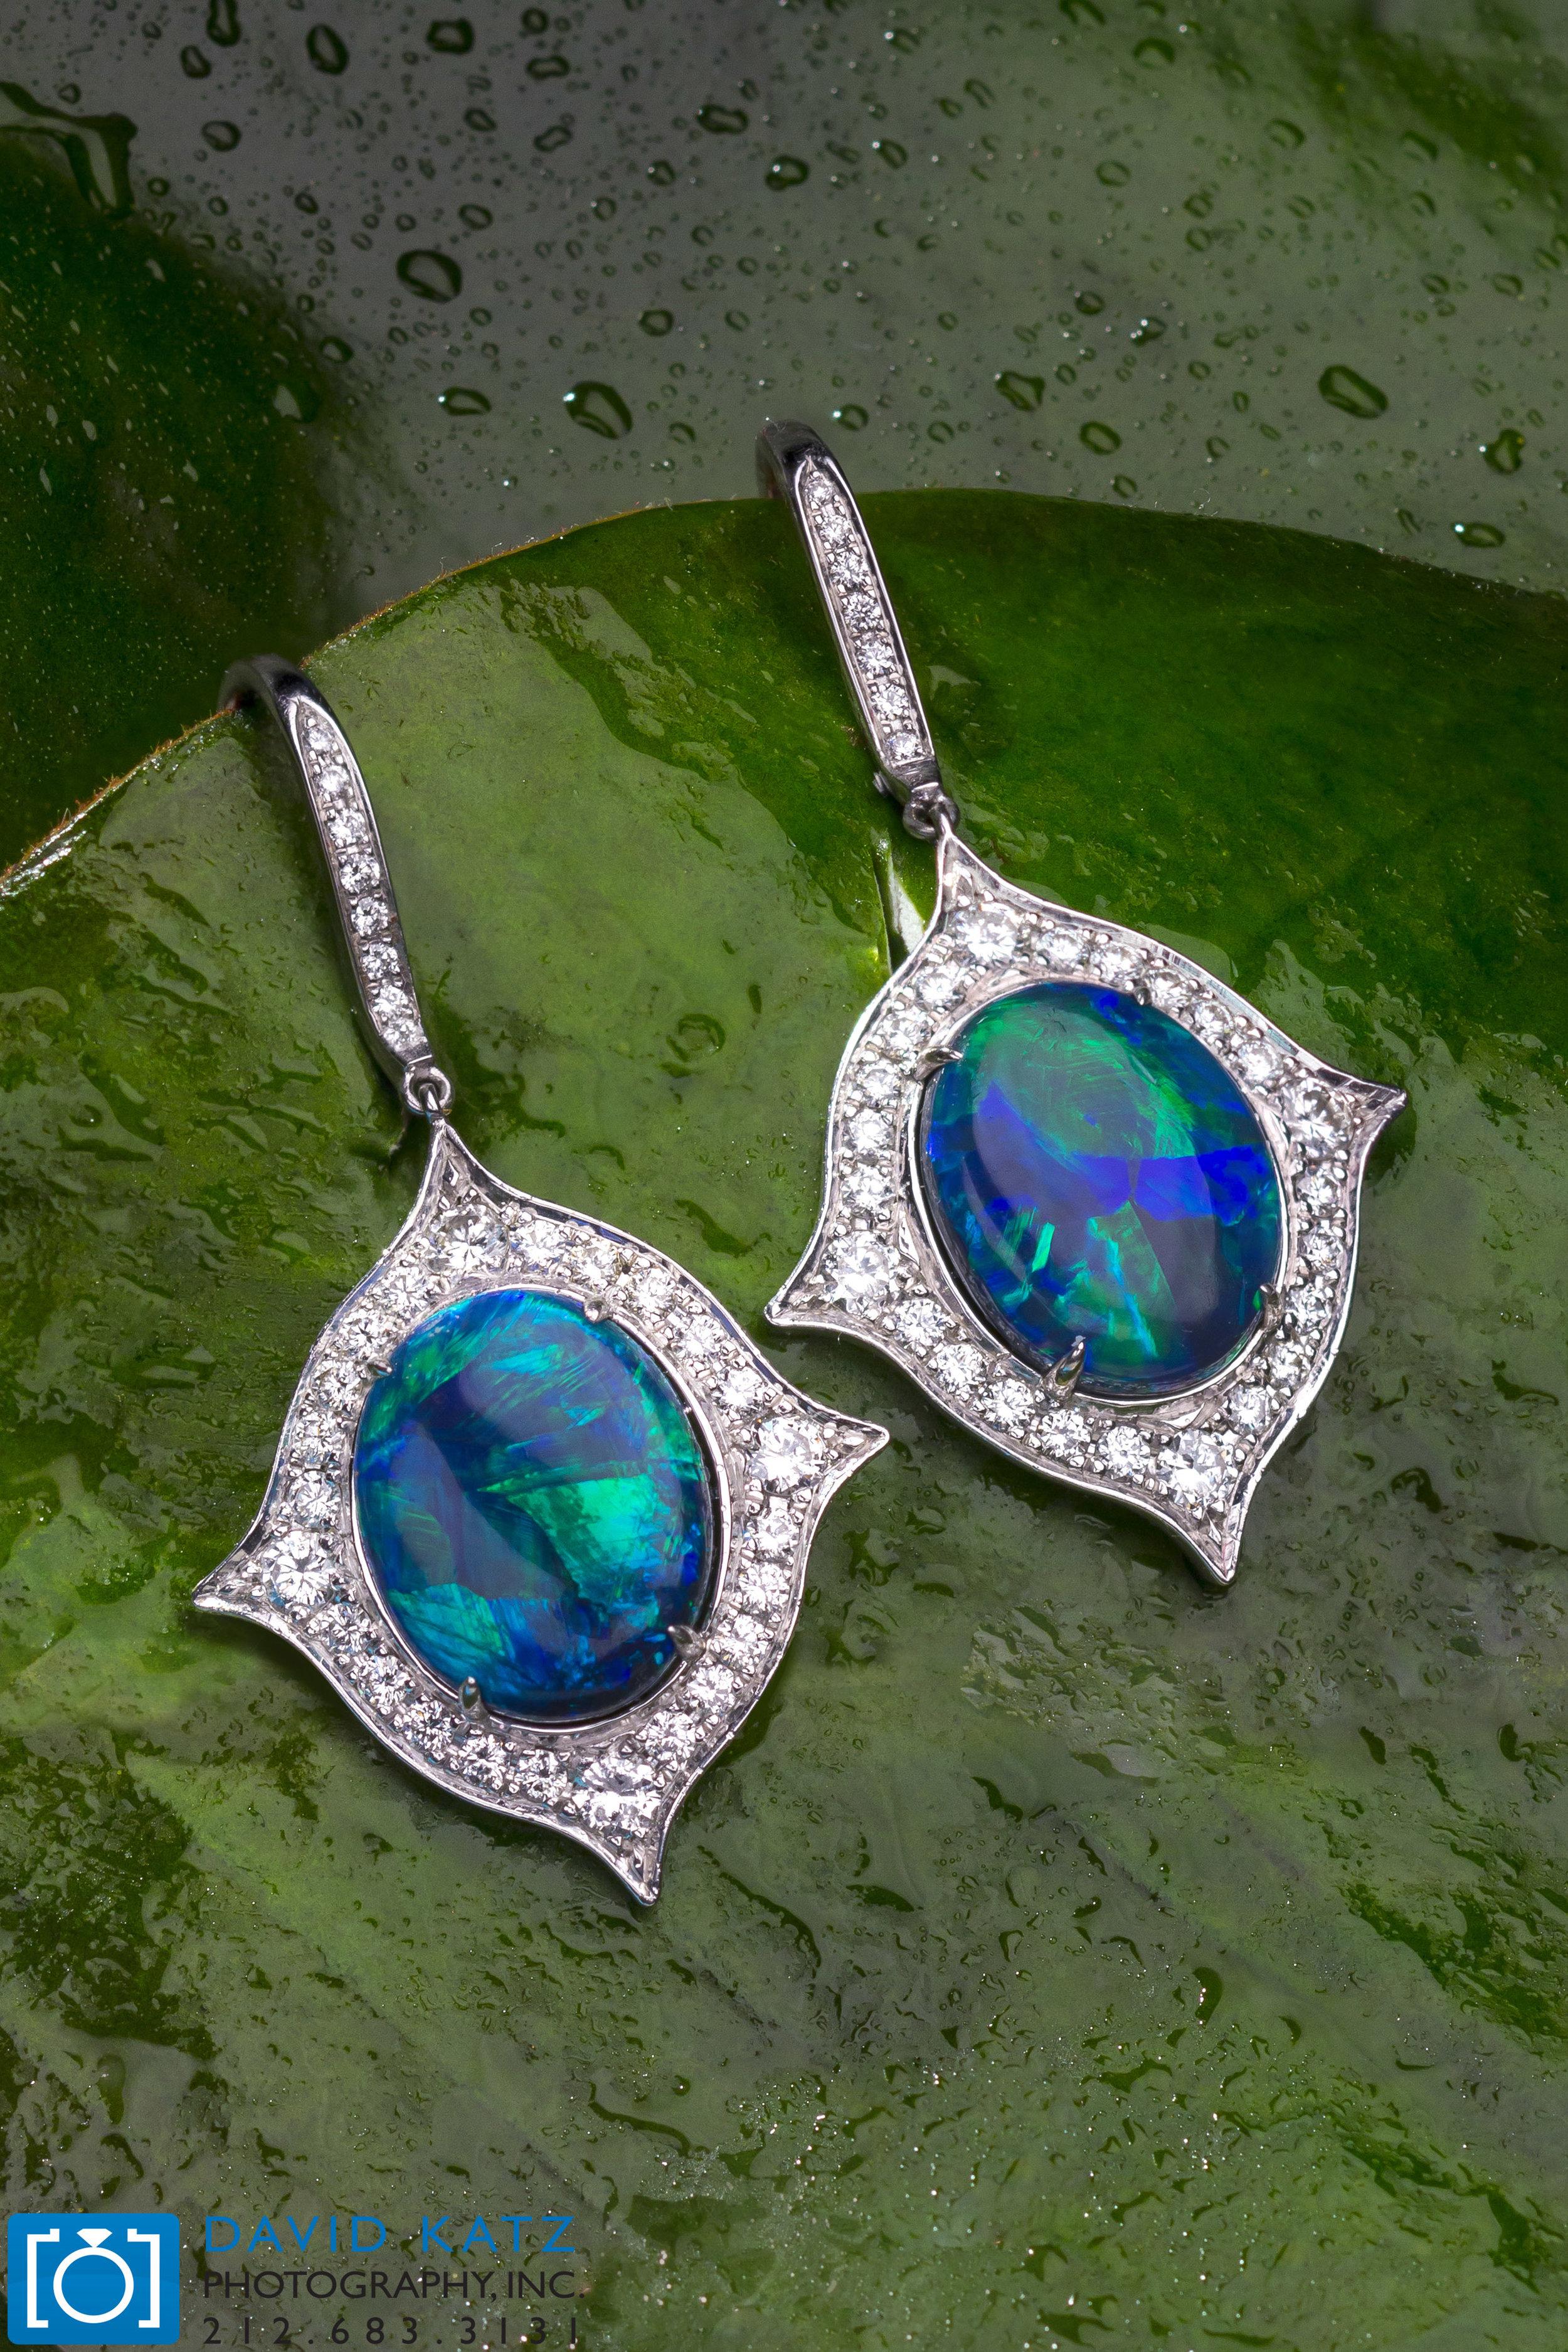 Opal Earrings on Leaf2_NEWLOGO.jpg